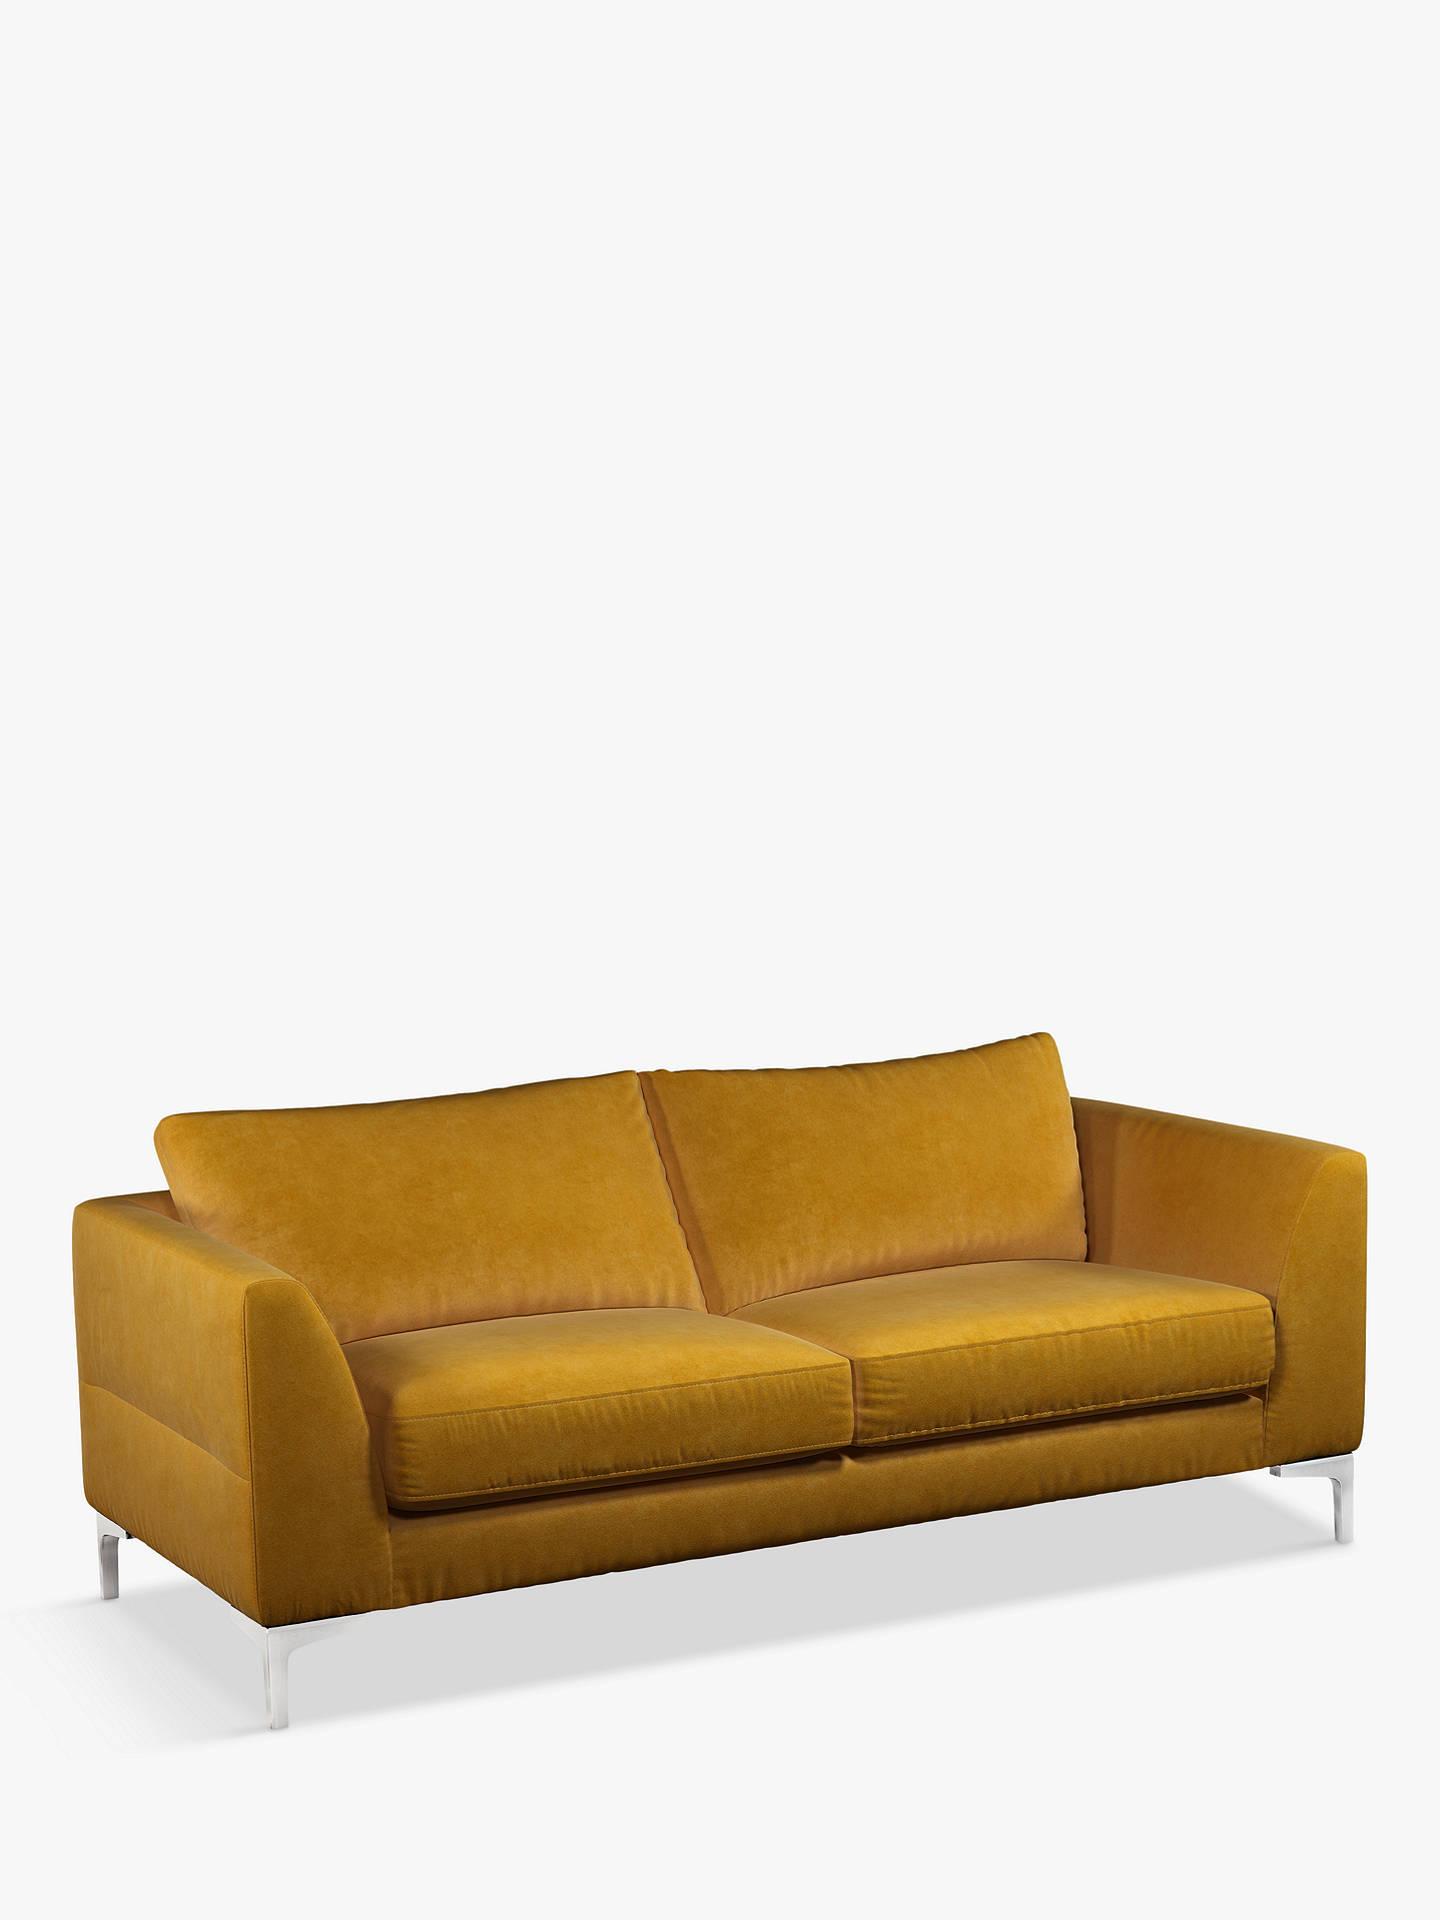 Amazing John Lewis Partners Belgrave Large 3 Seater Velvet Sofa Metal Leg Aquaclean Harriet Mustard Machost Co Dining Chair Design Ideas Machostcouk